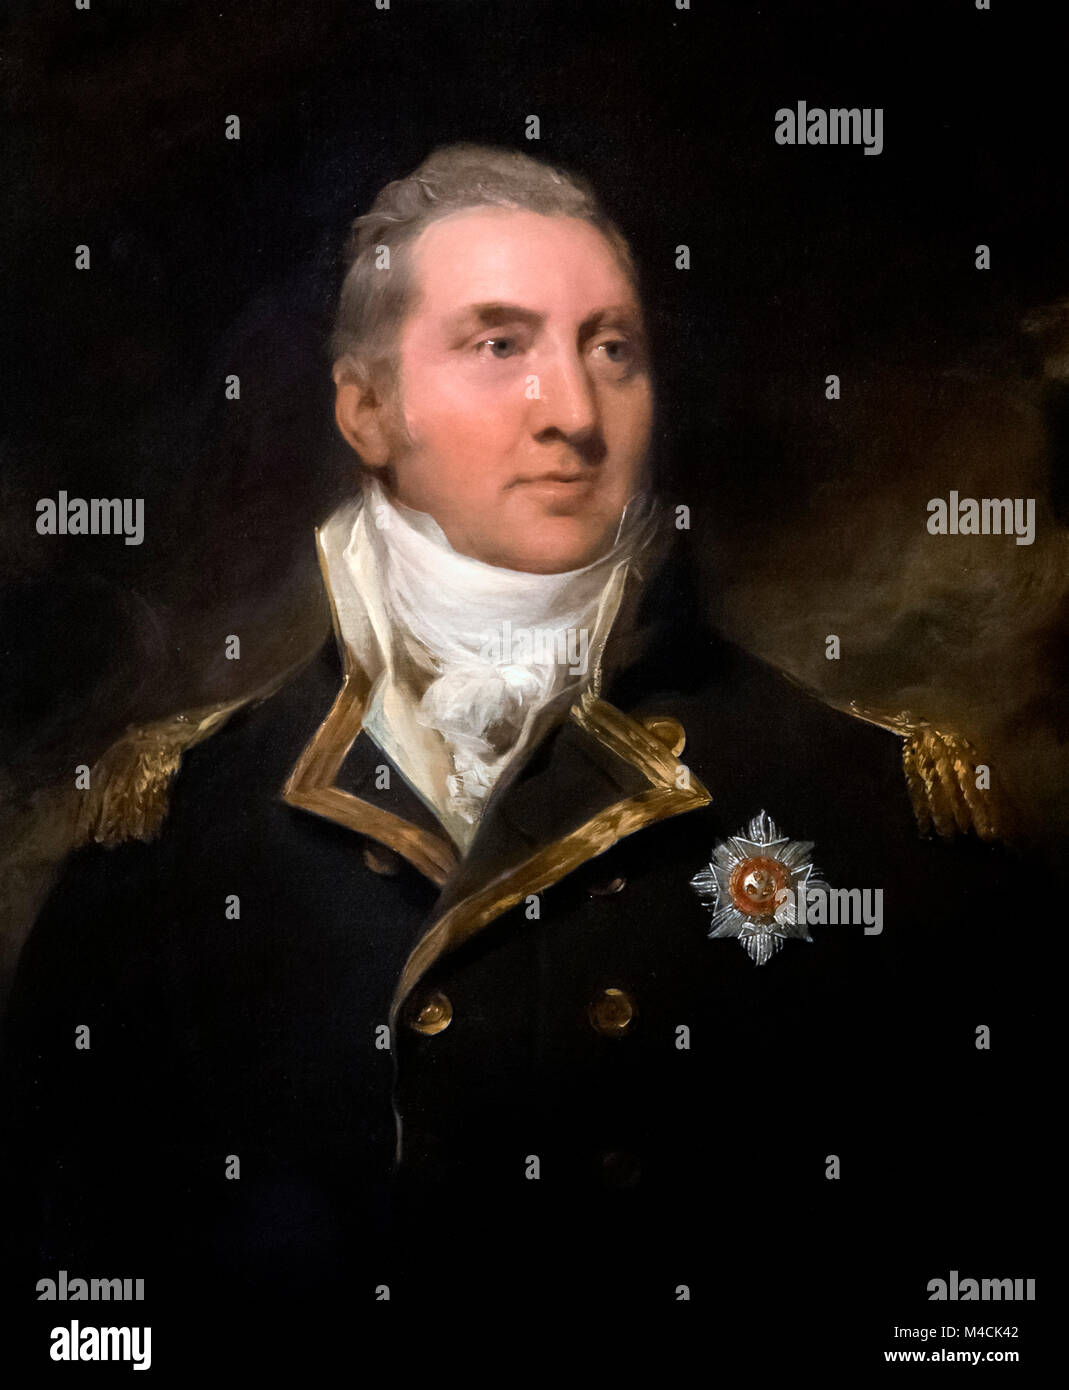 Captain Sir Edward Pellew. Portrait of Admiral Edward Pellew, 1st Viscount Exmouth (1757-1833) as a Captain c.1797, - Stock Image